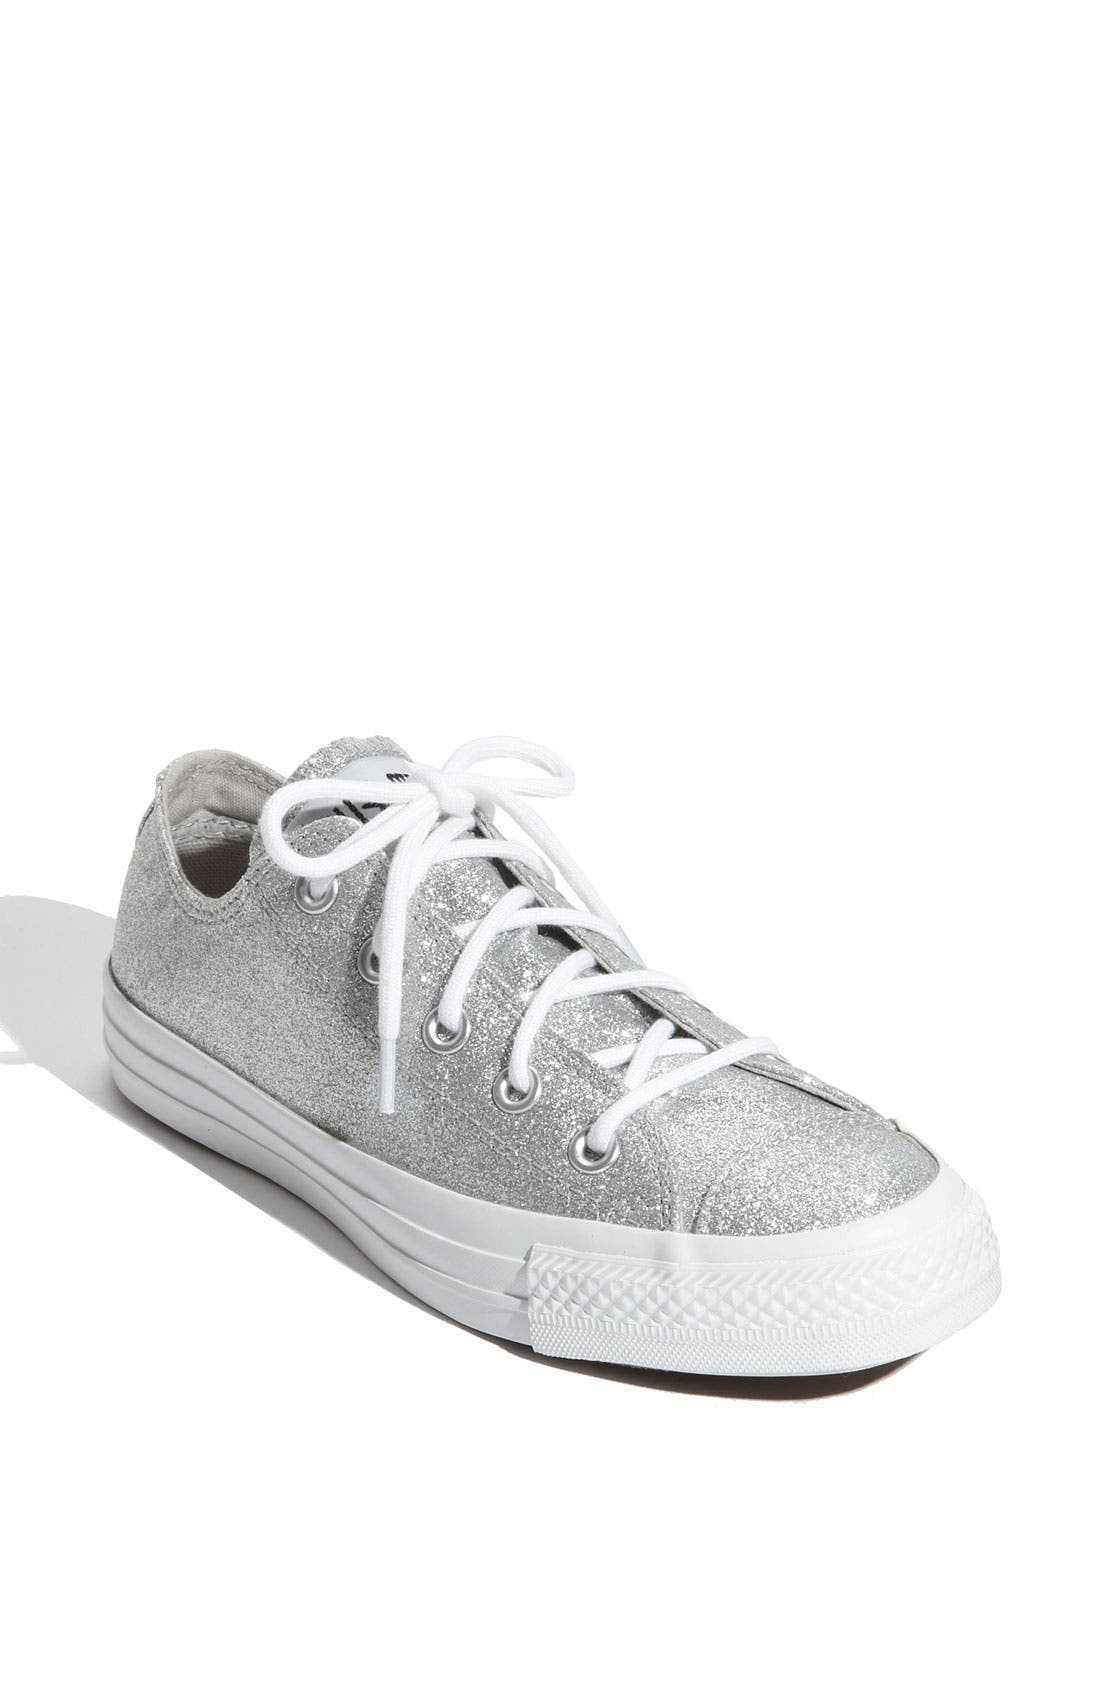 Chuck Taylor<sup>®</sup> 'Winter Glitz' Sneaker,                         Main,                         color, Silver